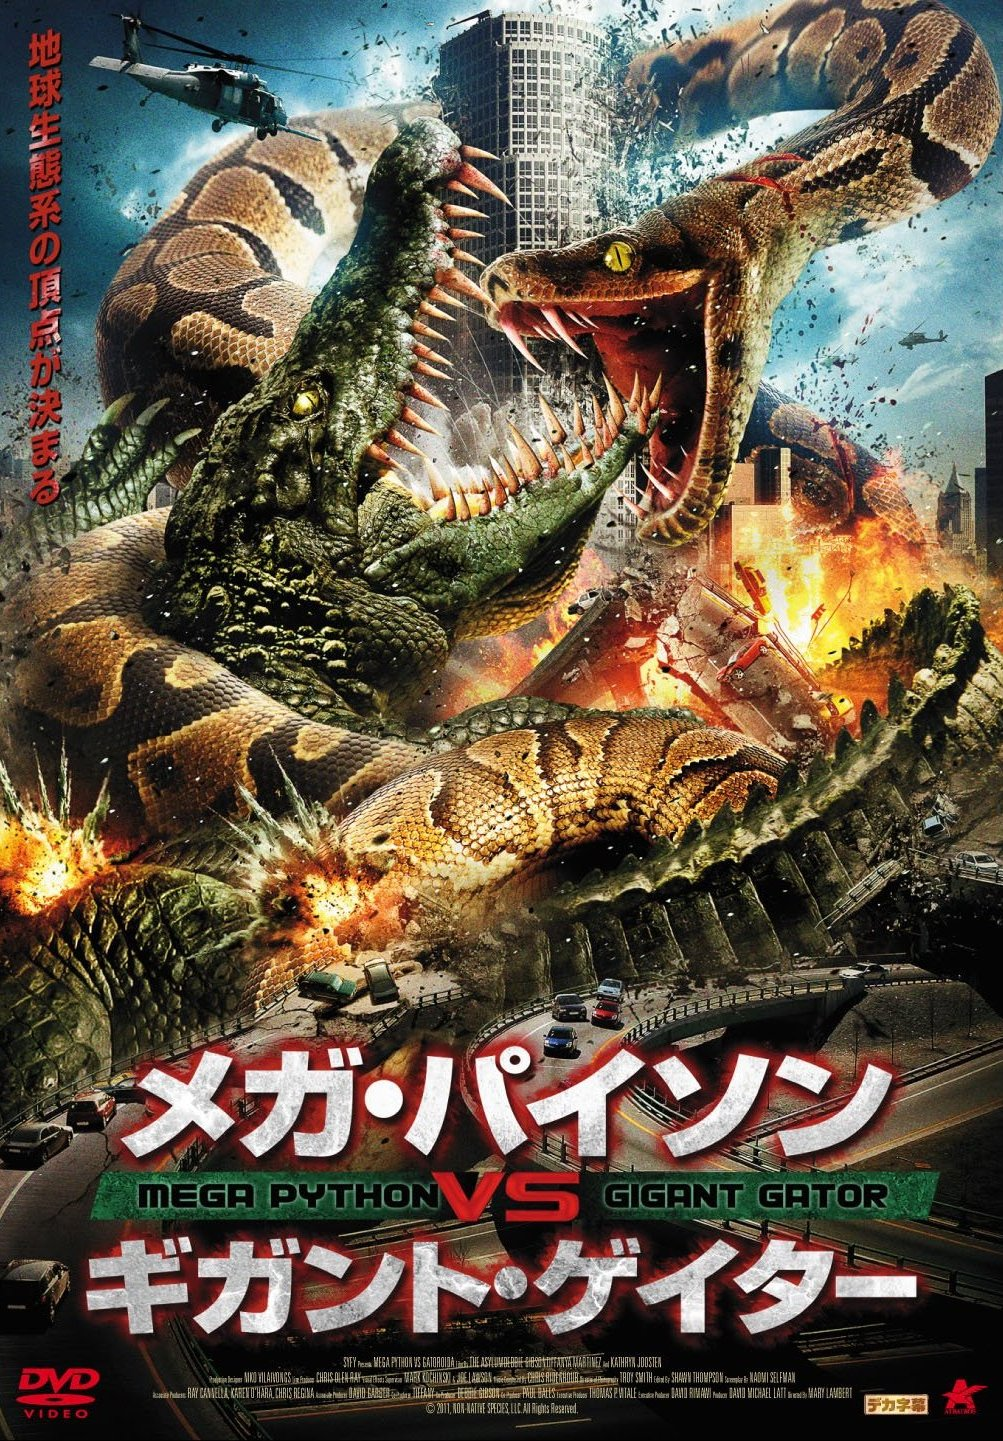 Mega Python vs. Gatoroid | Download free movies. Watch